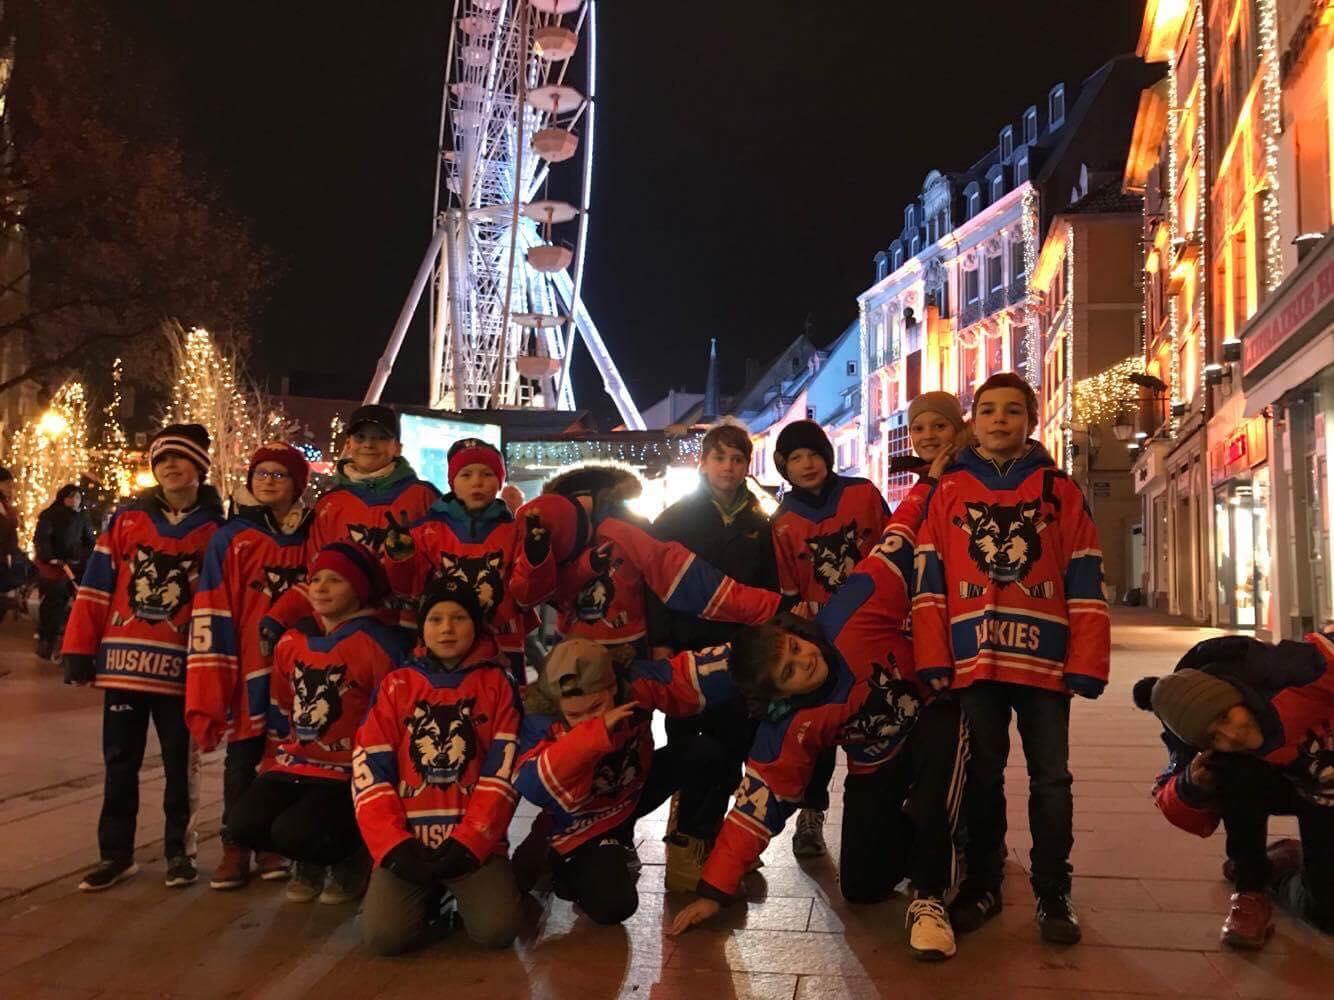 U11 B in Mulhouse December 2nd & 3rd